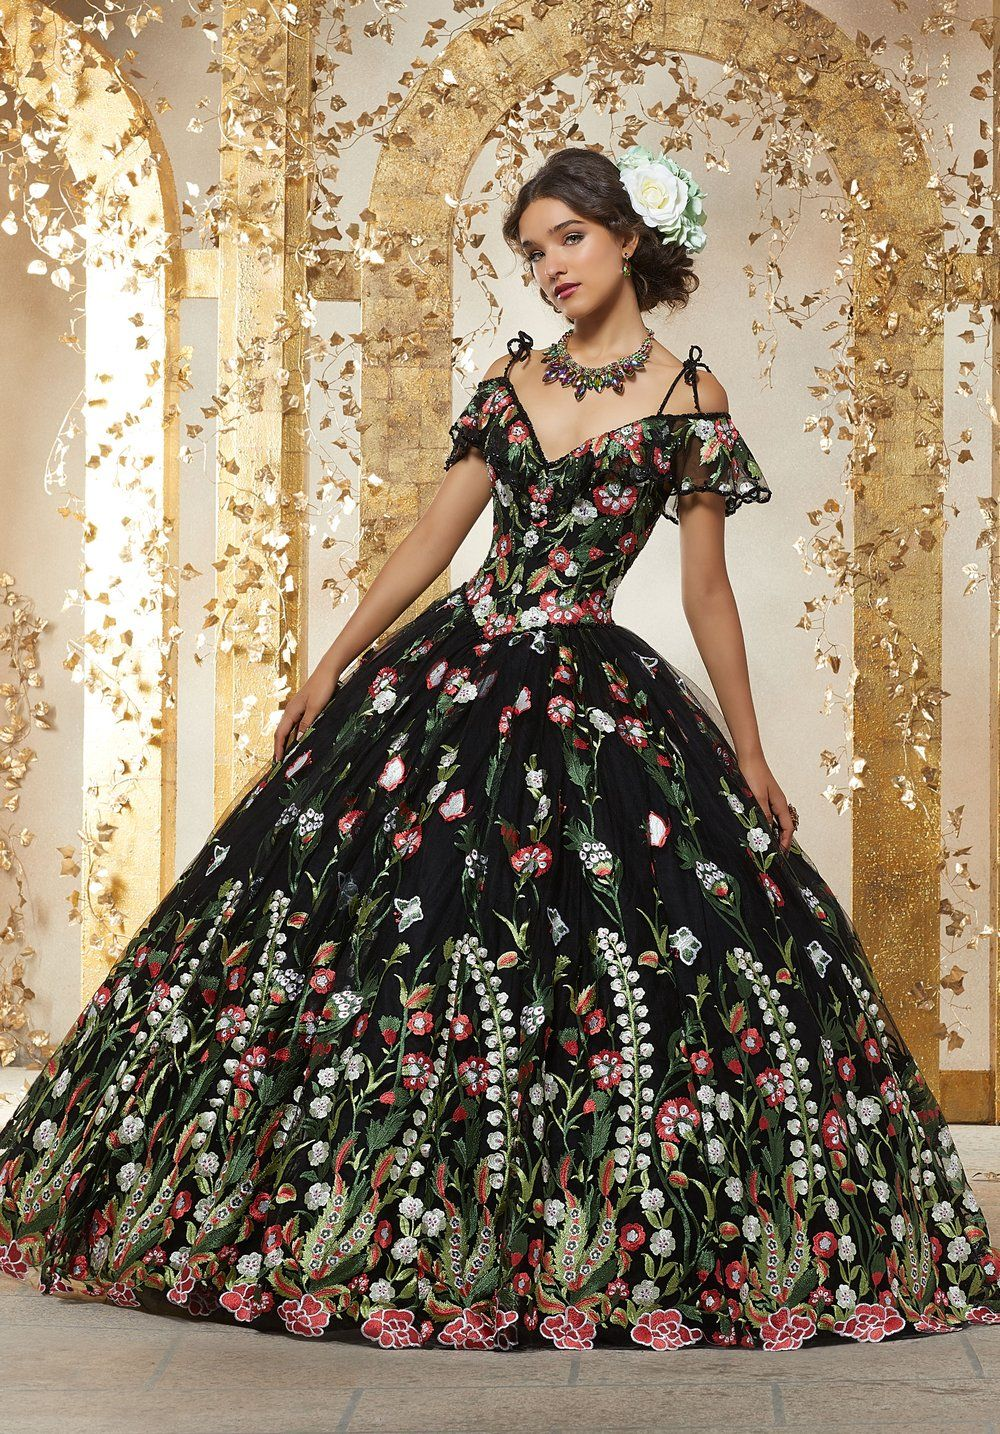 Vizcaya By Mori Lee 89238 Quinceanera Dress In 2021 Black Quinceanera Dresses Mexican Quinceanera Dresses Quince Dresses [ 1434 x 1000 Pixel ]